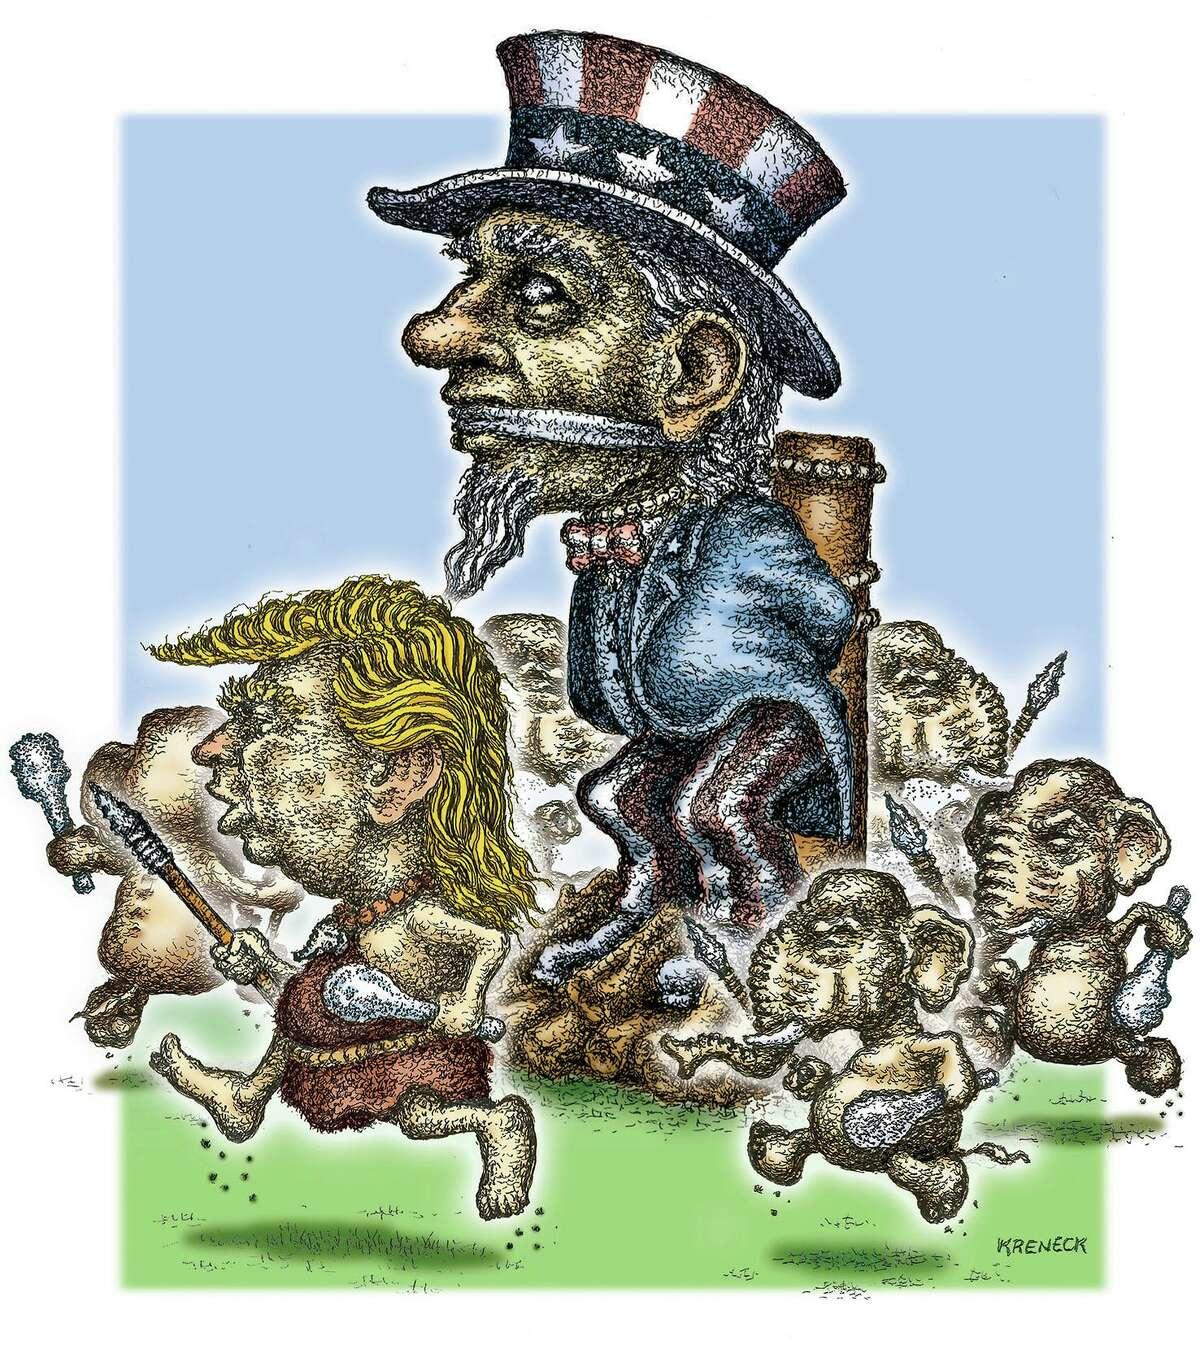 Kevin Kreneck illustration about Donald Trump and GOP.